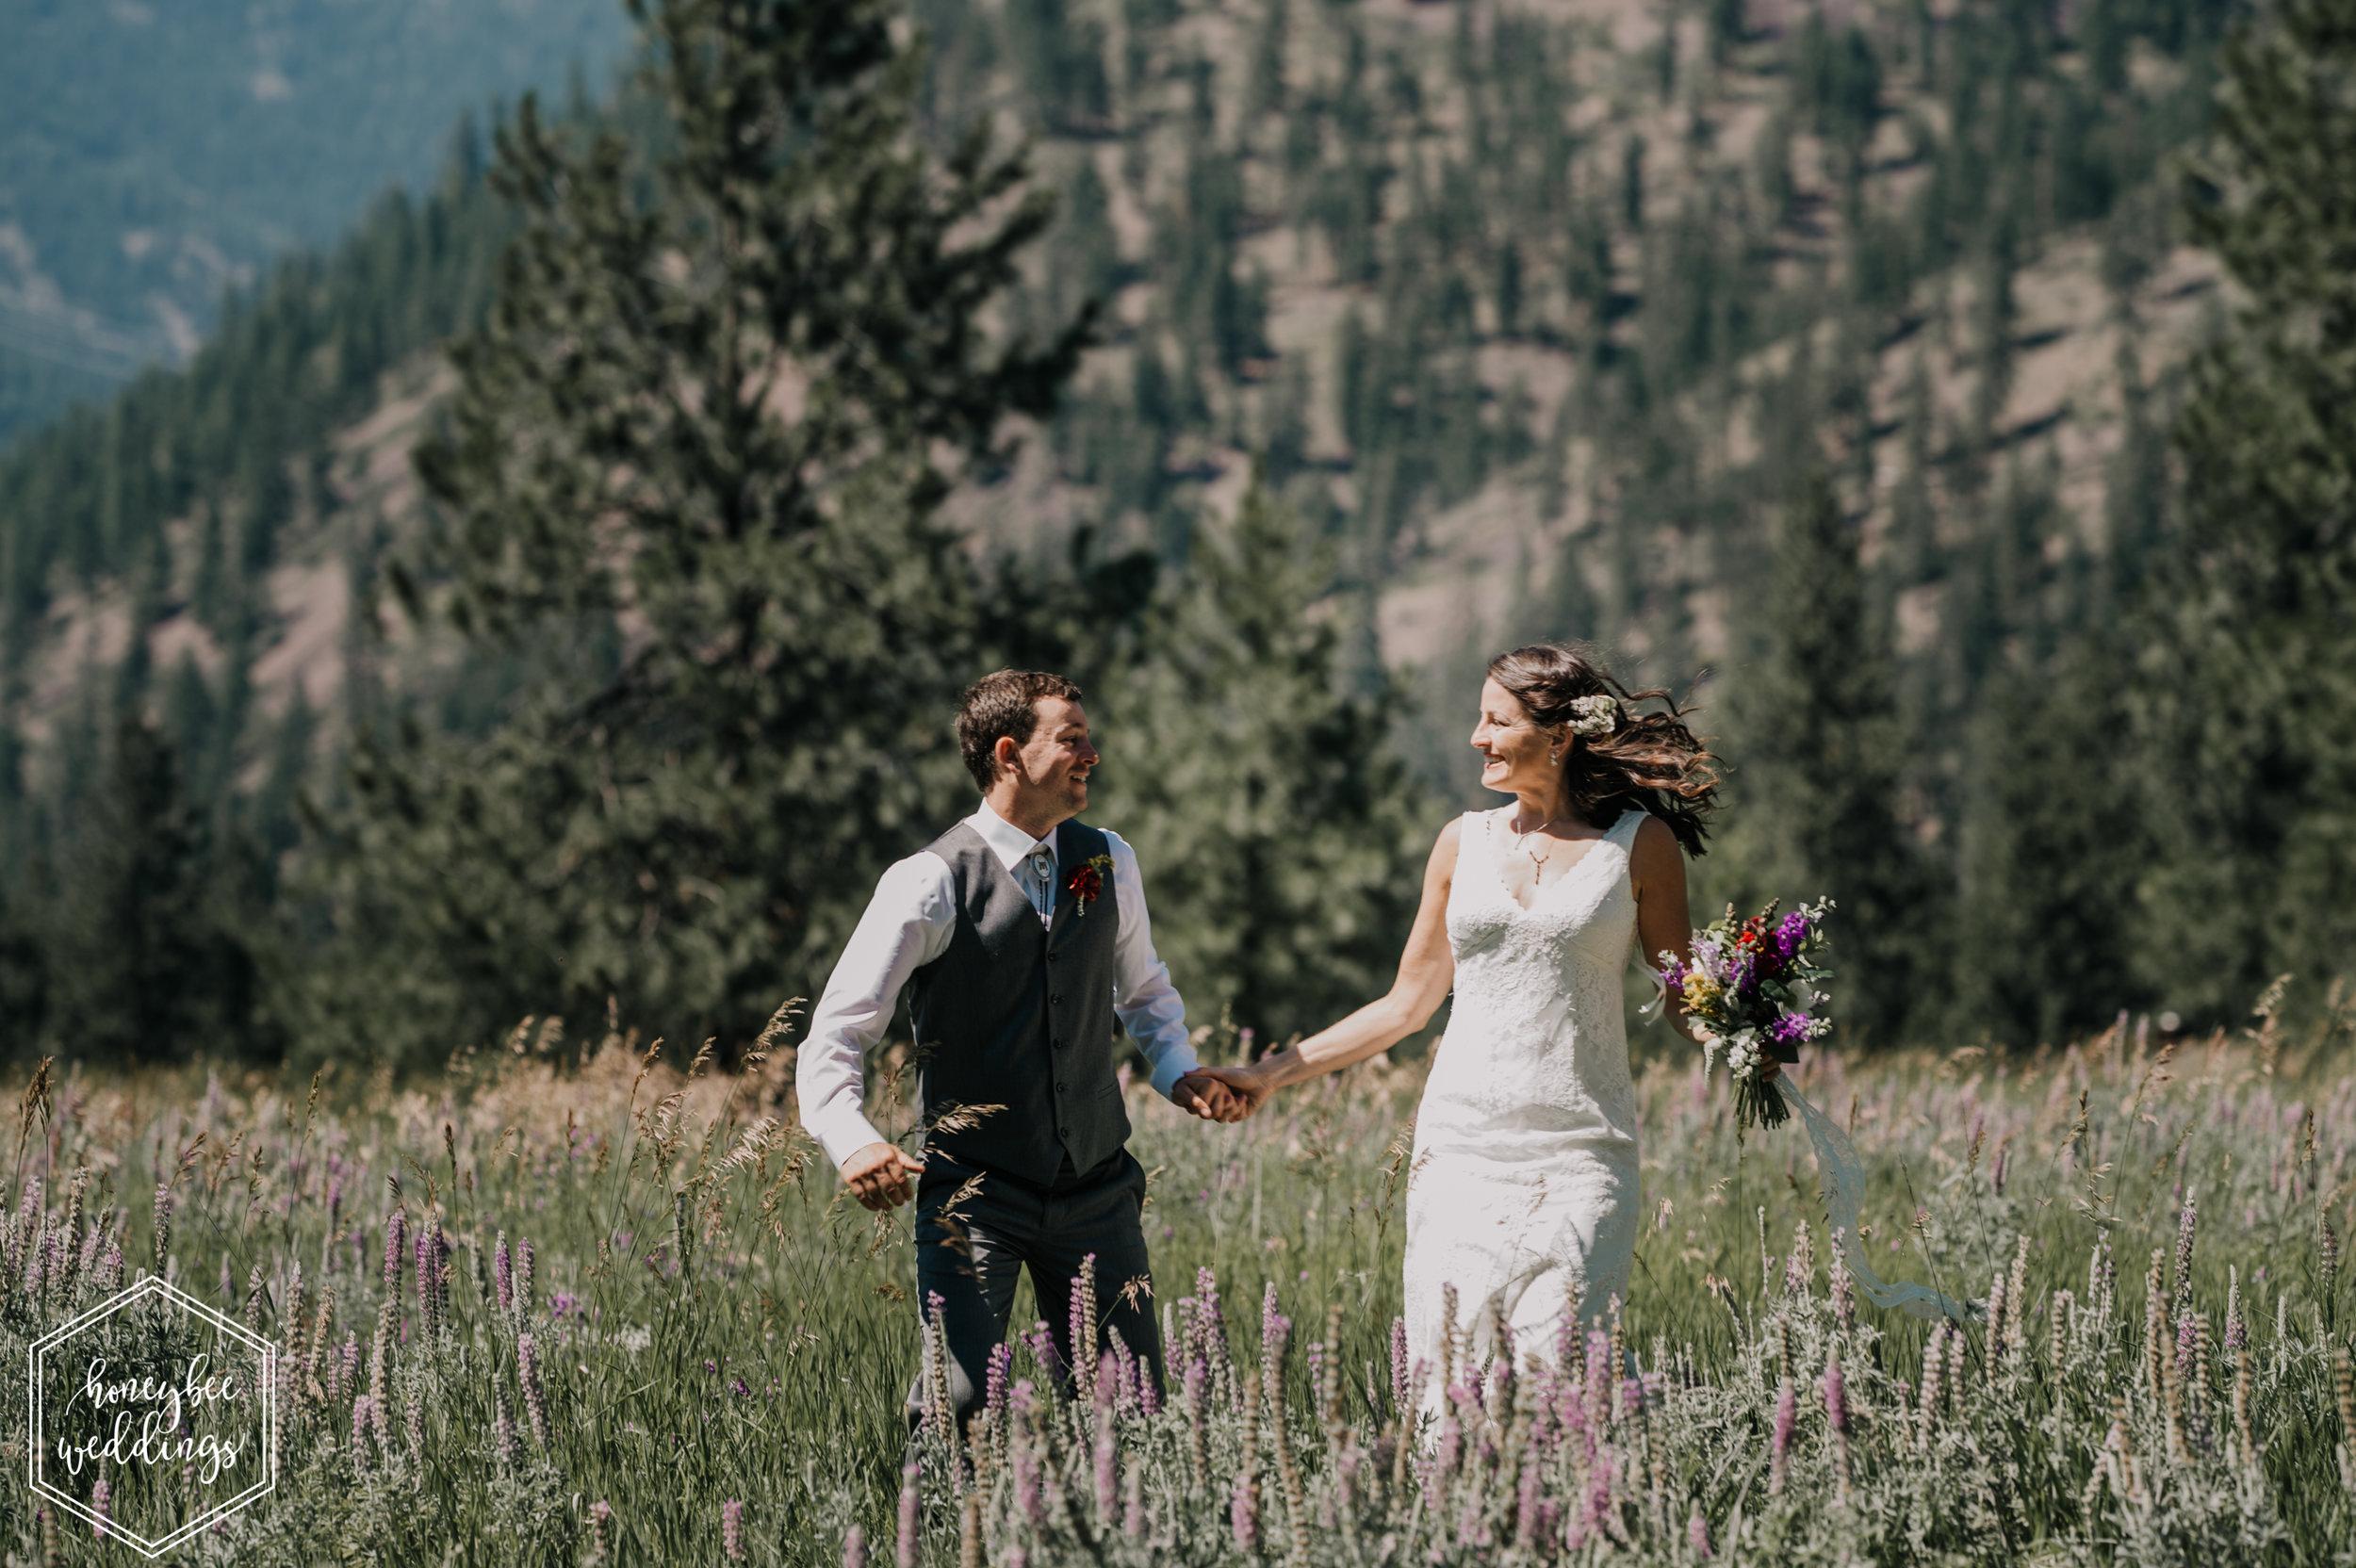 127 White Raven Wedding_Montana Wedding Photographer_Honeybee Weddings_ Meghan Maloney + Arza Hammond 2018-8392.jpg